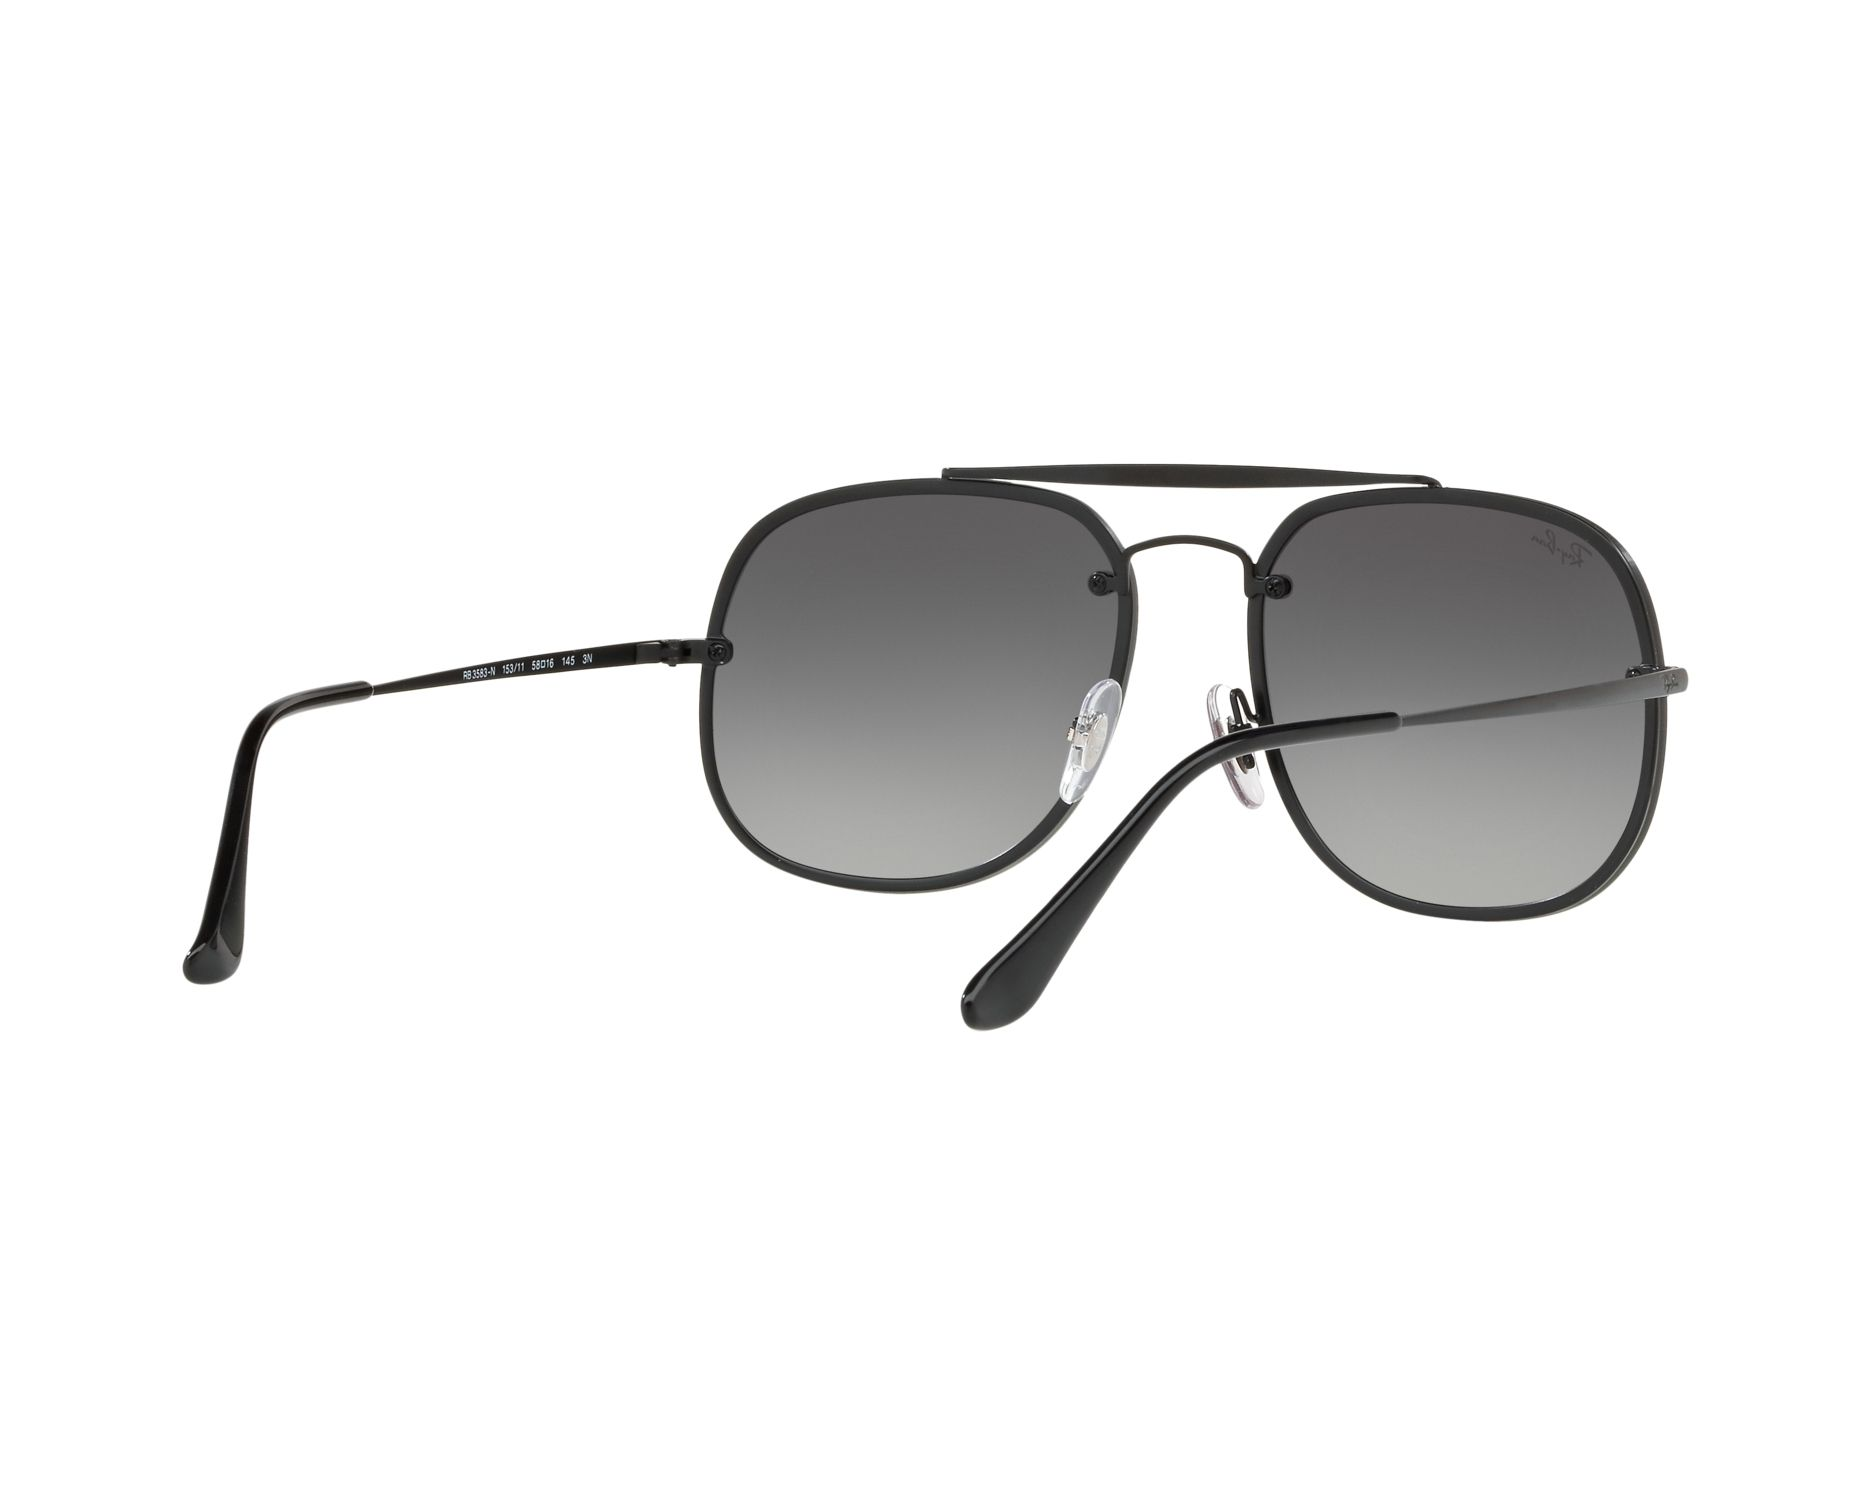 585ab80fd0f Sonnenbrillen Ray-Ban RB-3583-N 153 11 58-16 schwarz